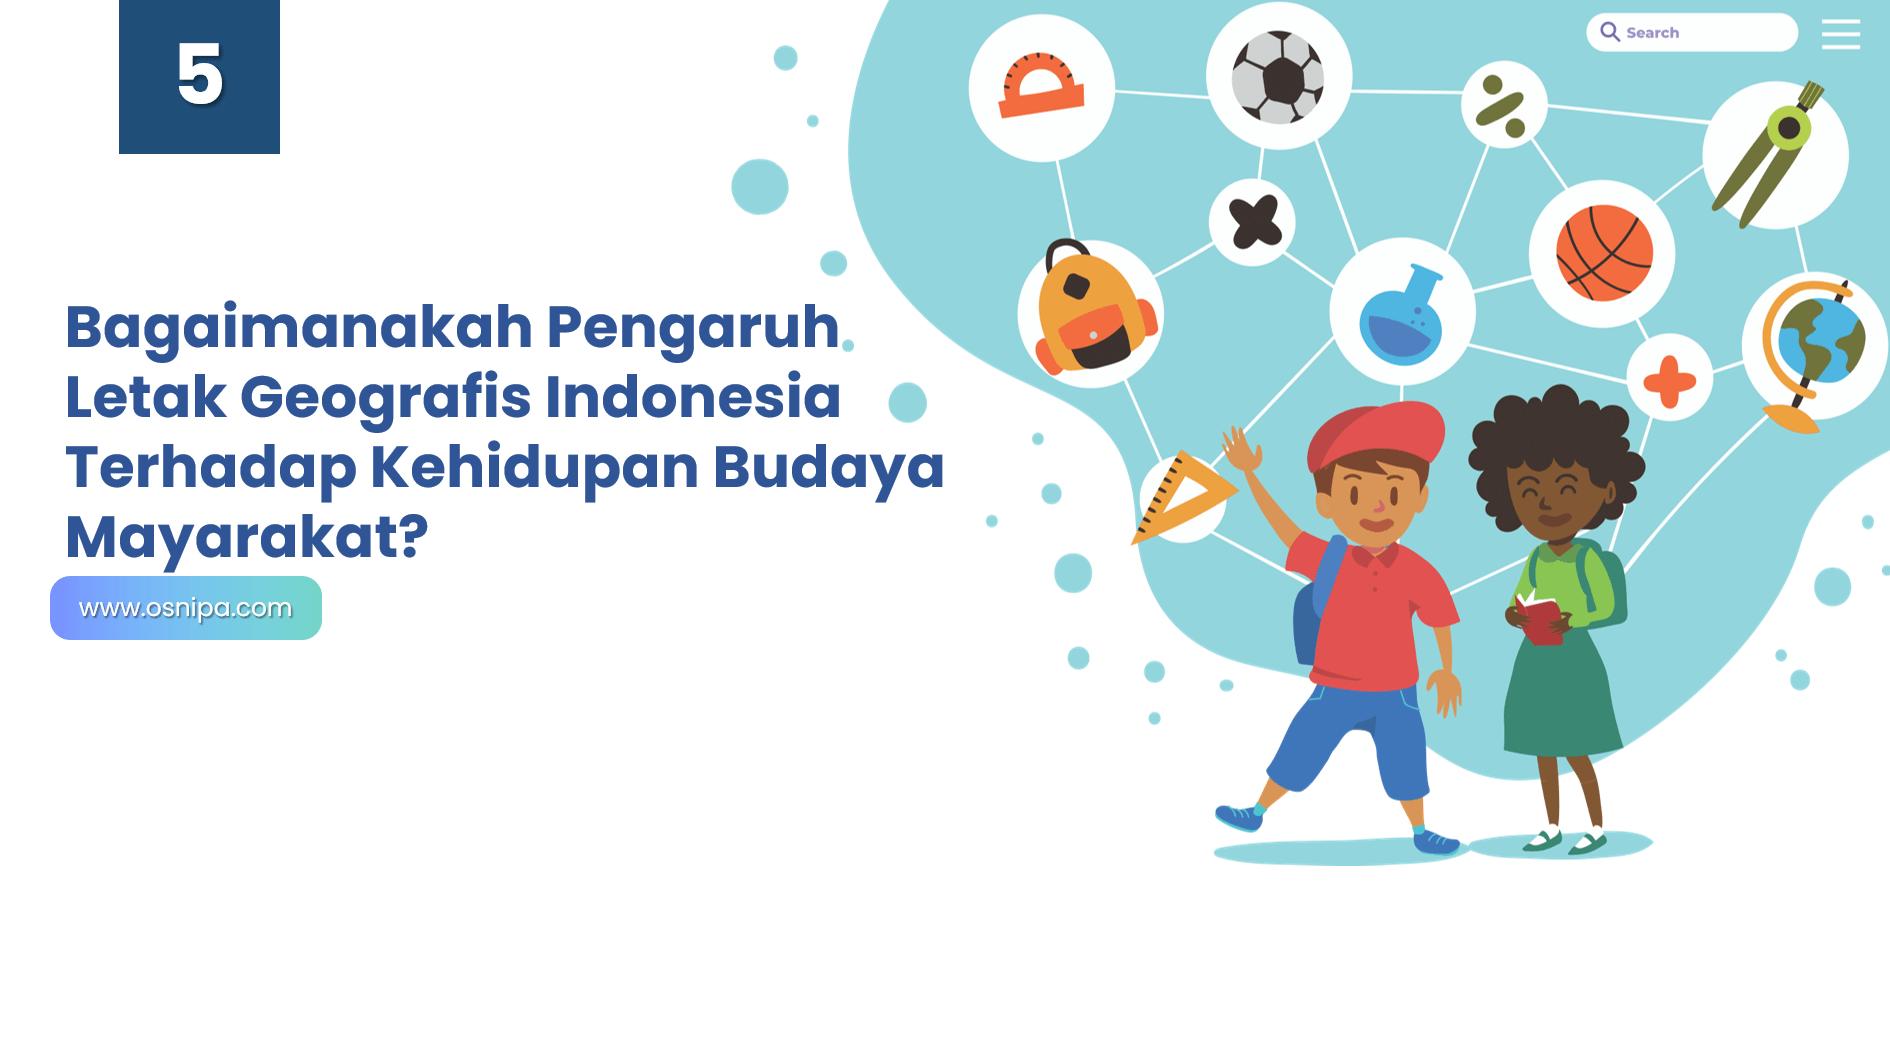 Bagaimanakah Pengaruh Letak Geografis Indonesia Terhadap Kehidupan Budaya Mayarakat?